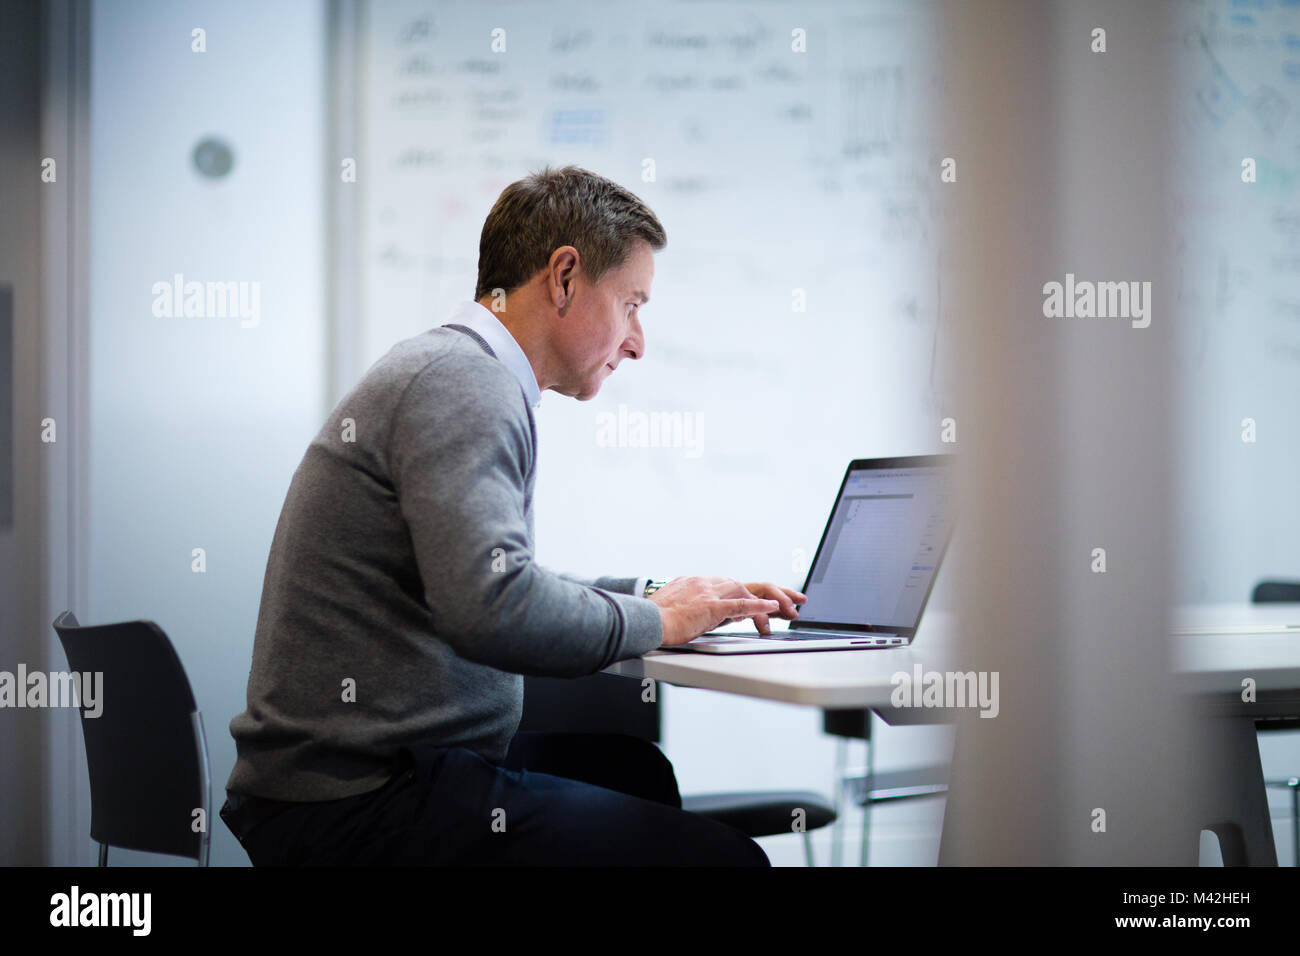 Businessman working on a presentation - Stock Image